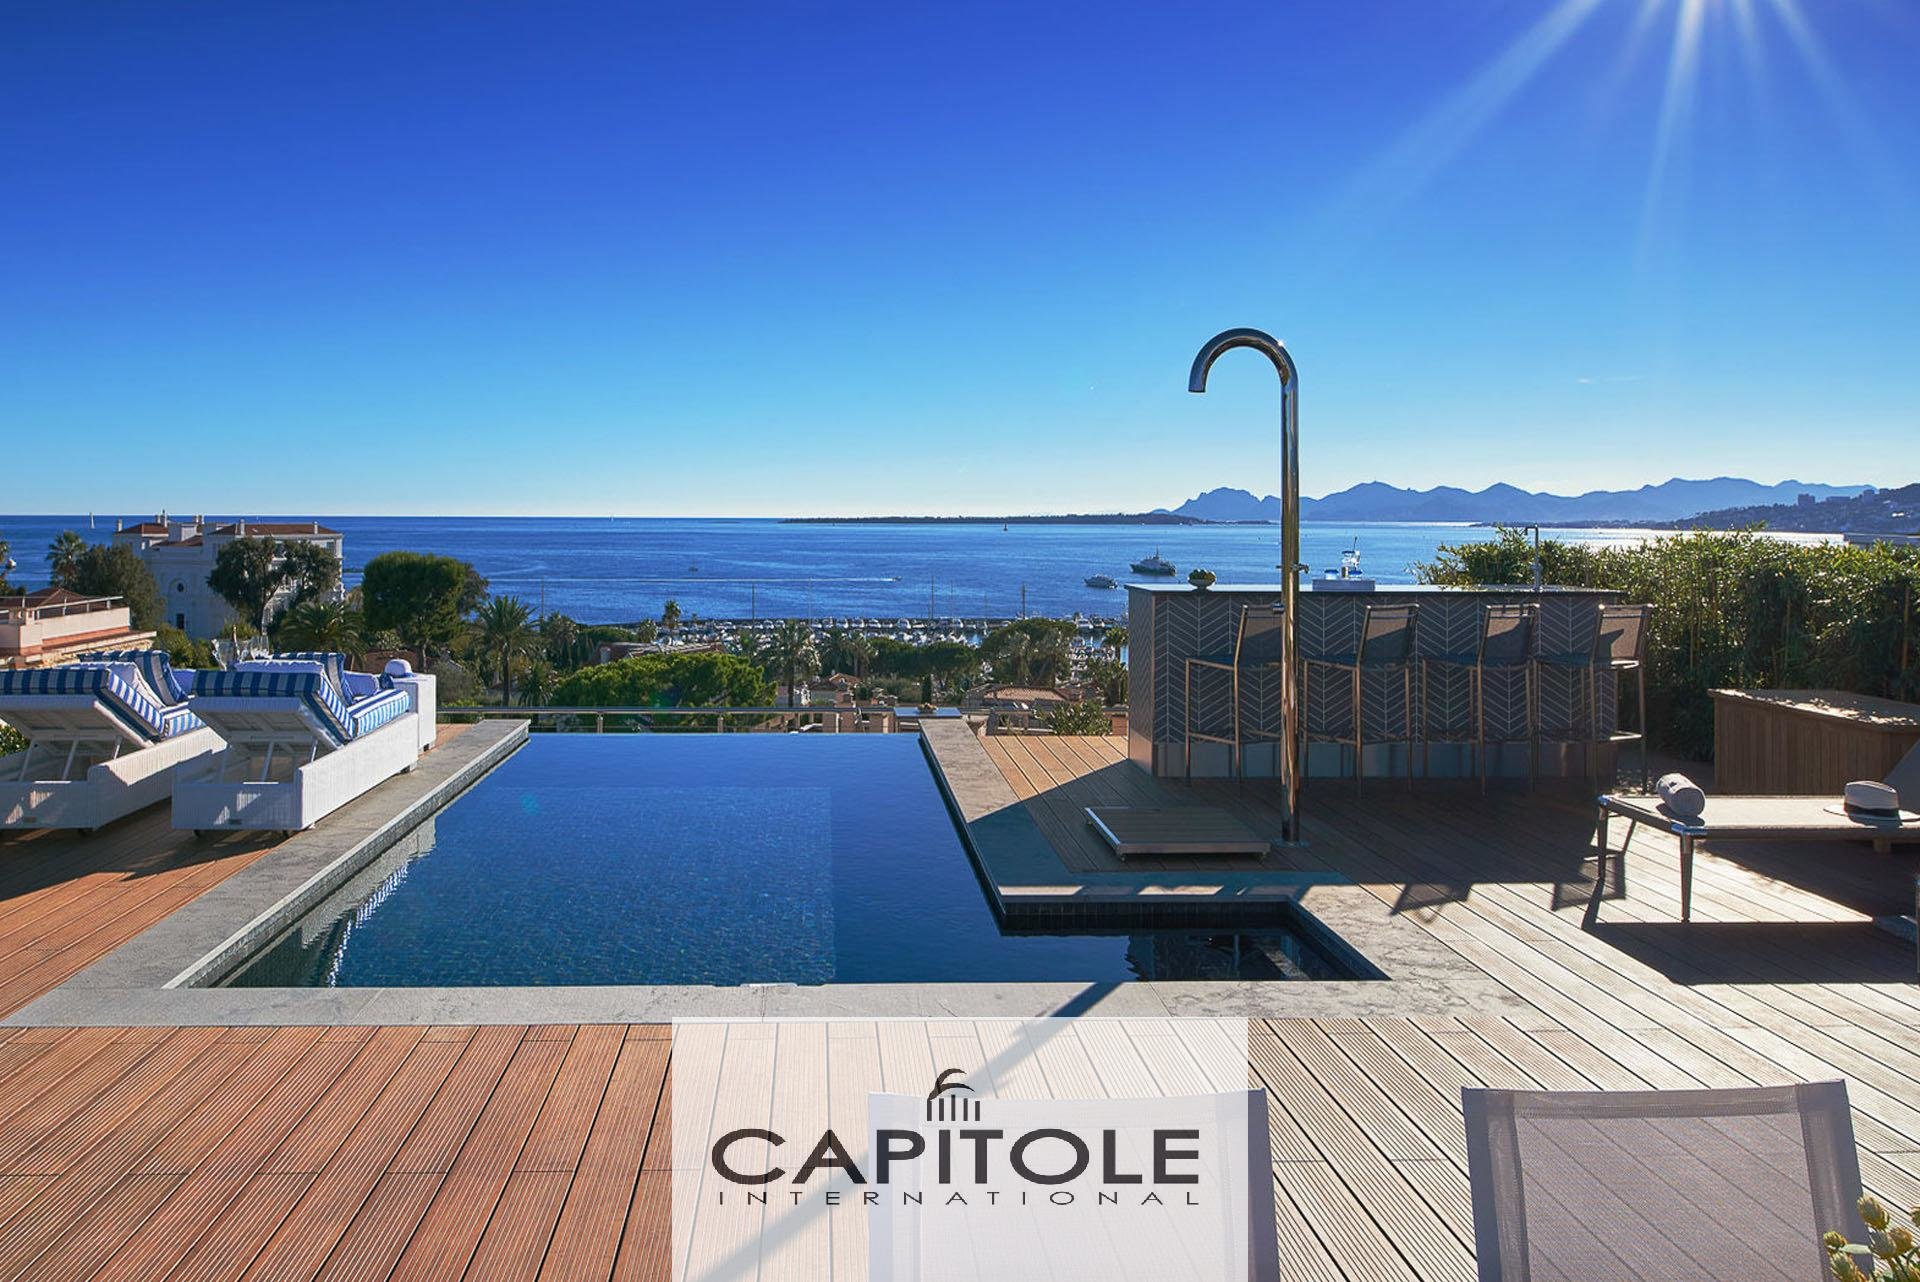 Vendita Appartamento - Cap d'Antibes Cap-d'Antibes